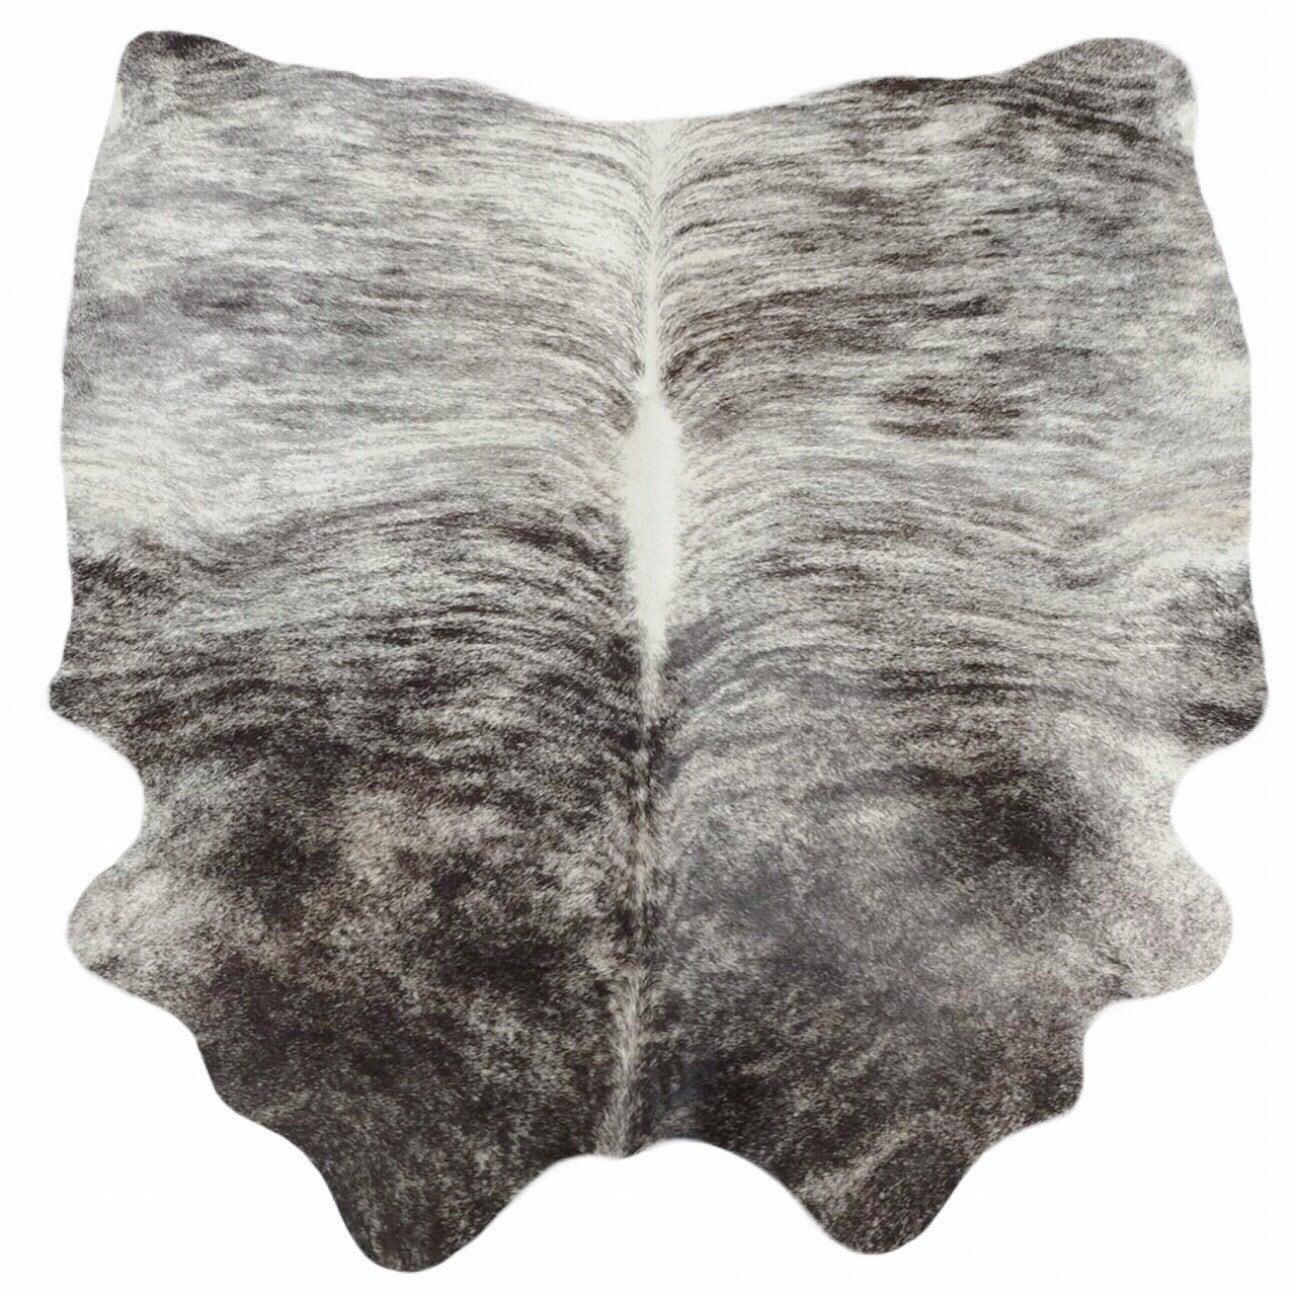 Cowhide Rug Cow Hide Leather Black White Gray Brindle